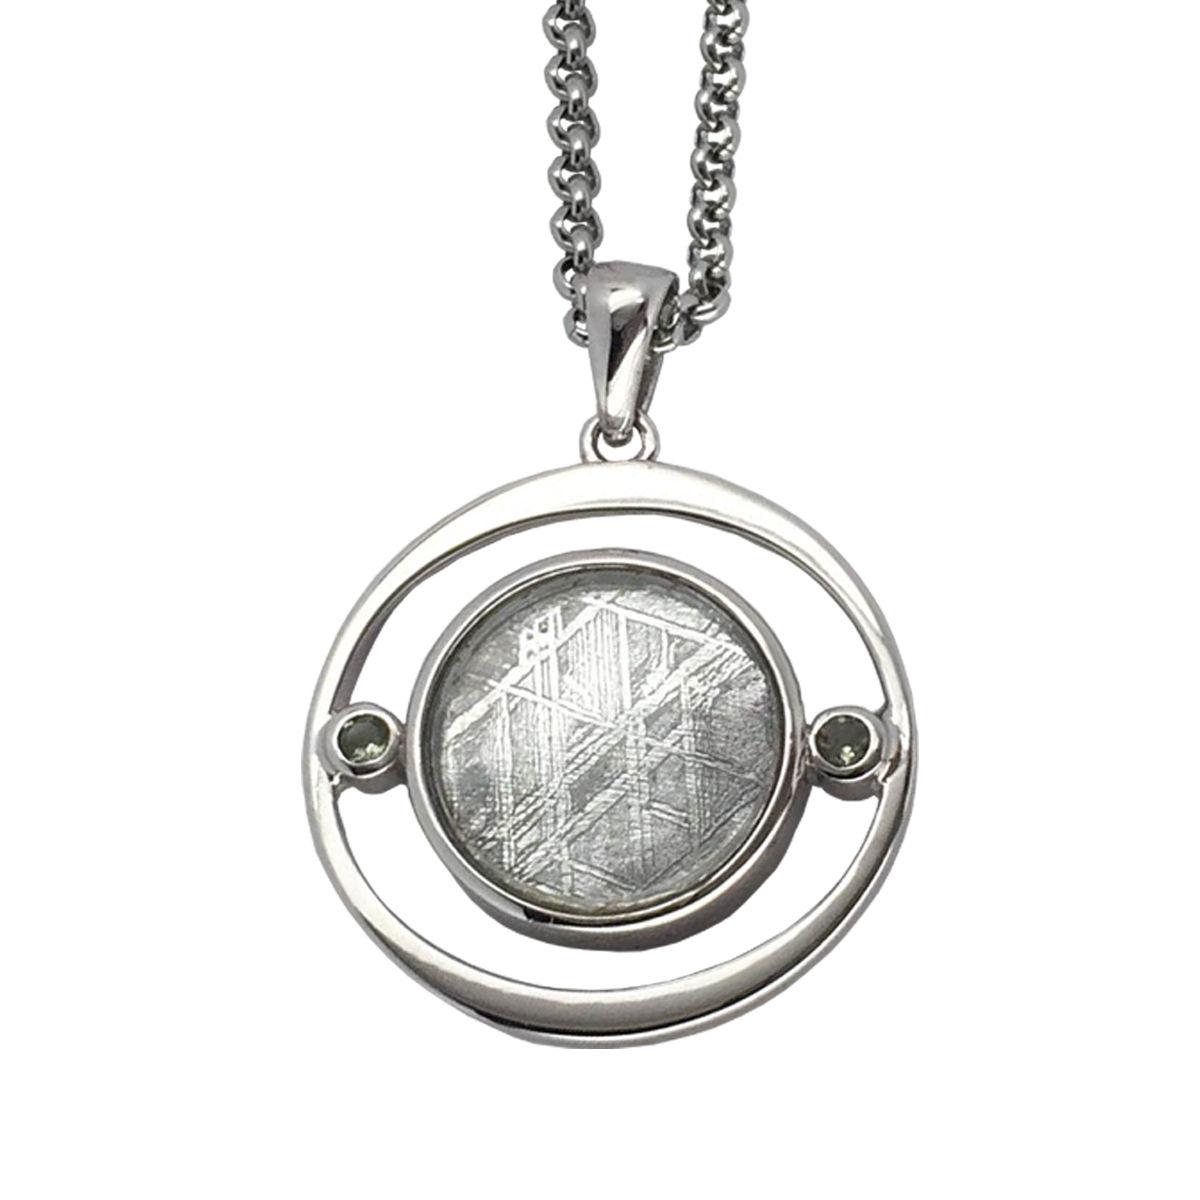 Meteorite Pendant Made In Sterling Silver